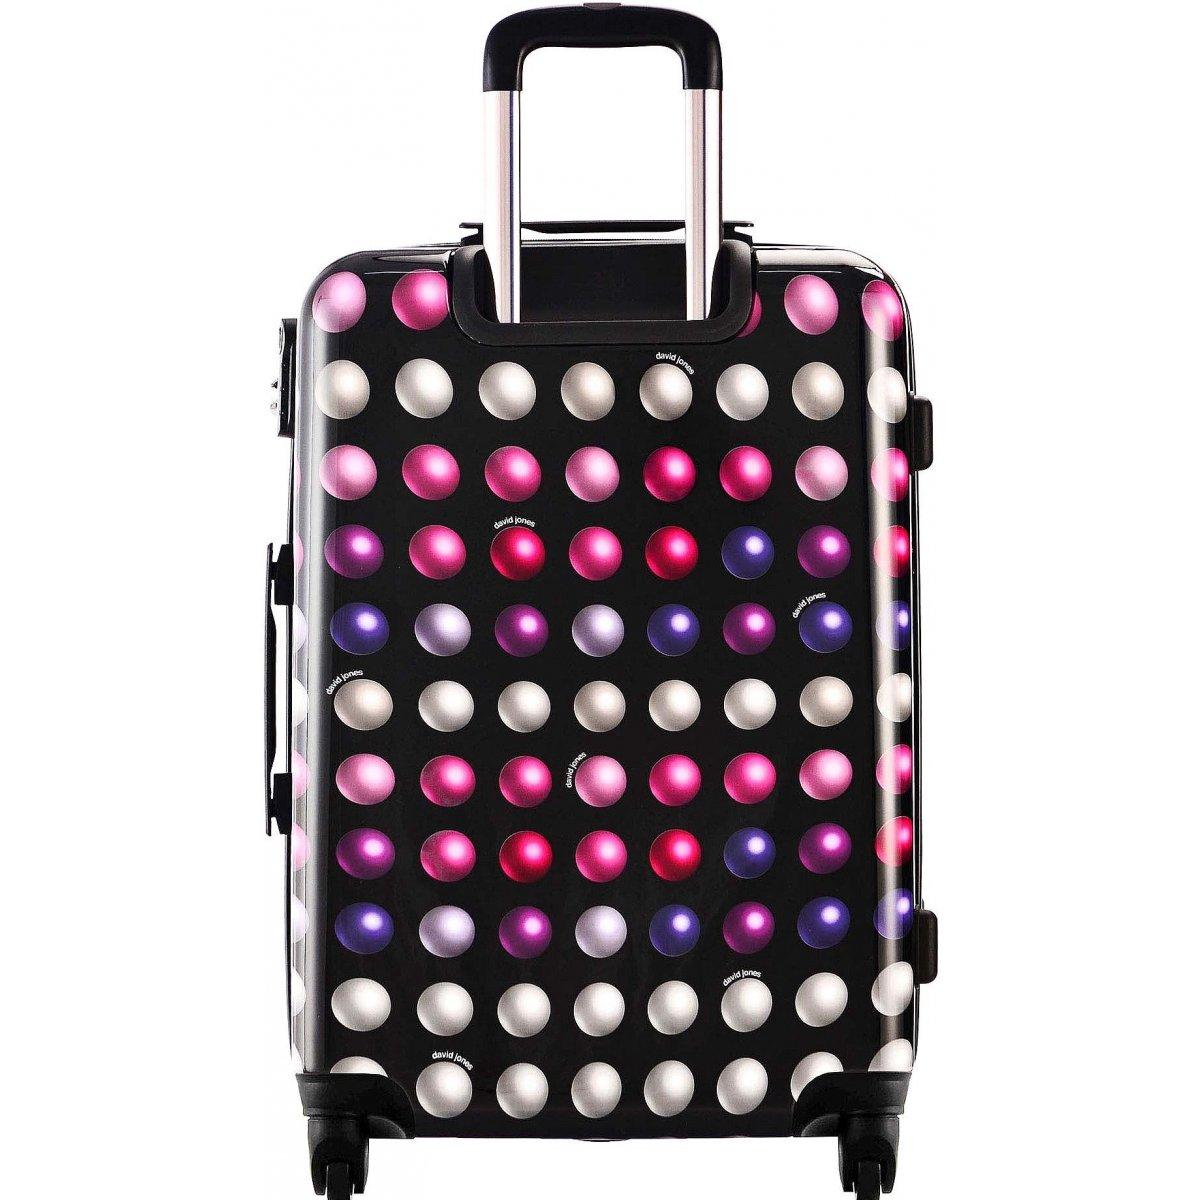 lot 3 valises rigides dont 1 valise cabine david jones abs poly ba20563 buzzrose couleur. Black Bedroom Furniture Sets. Home Design Ideas